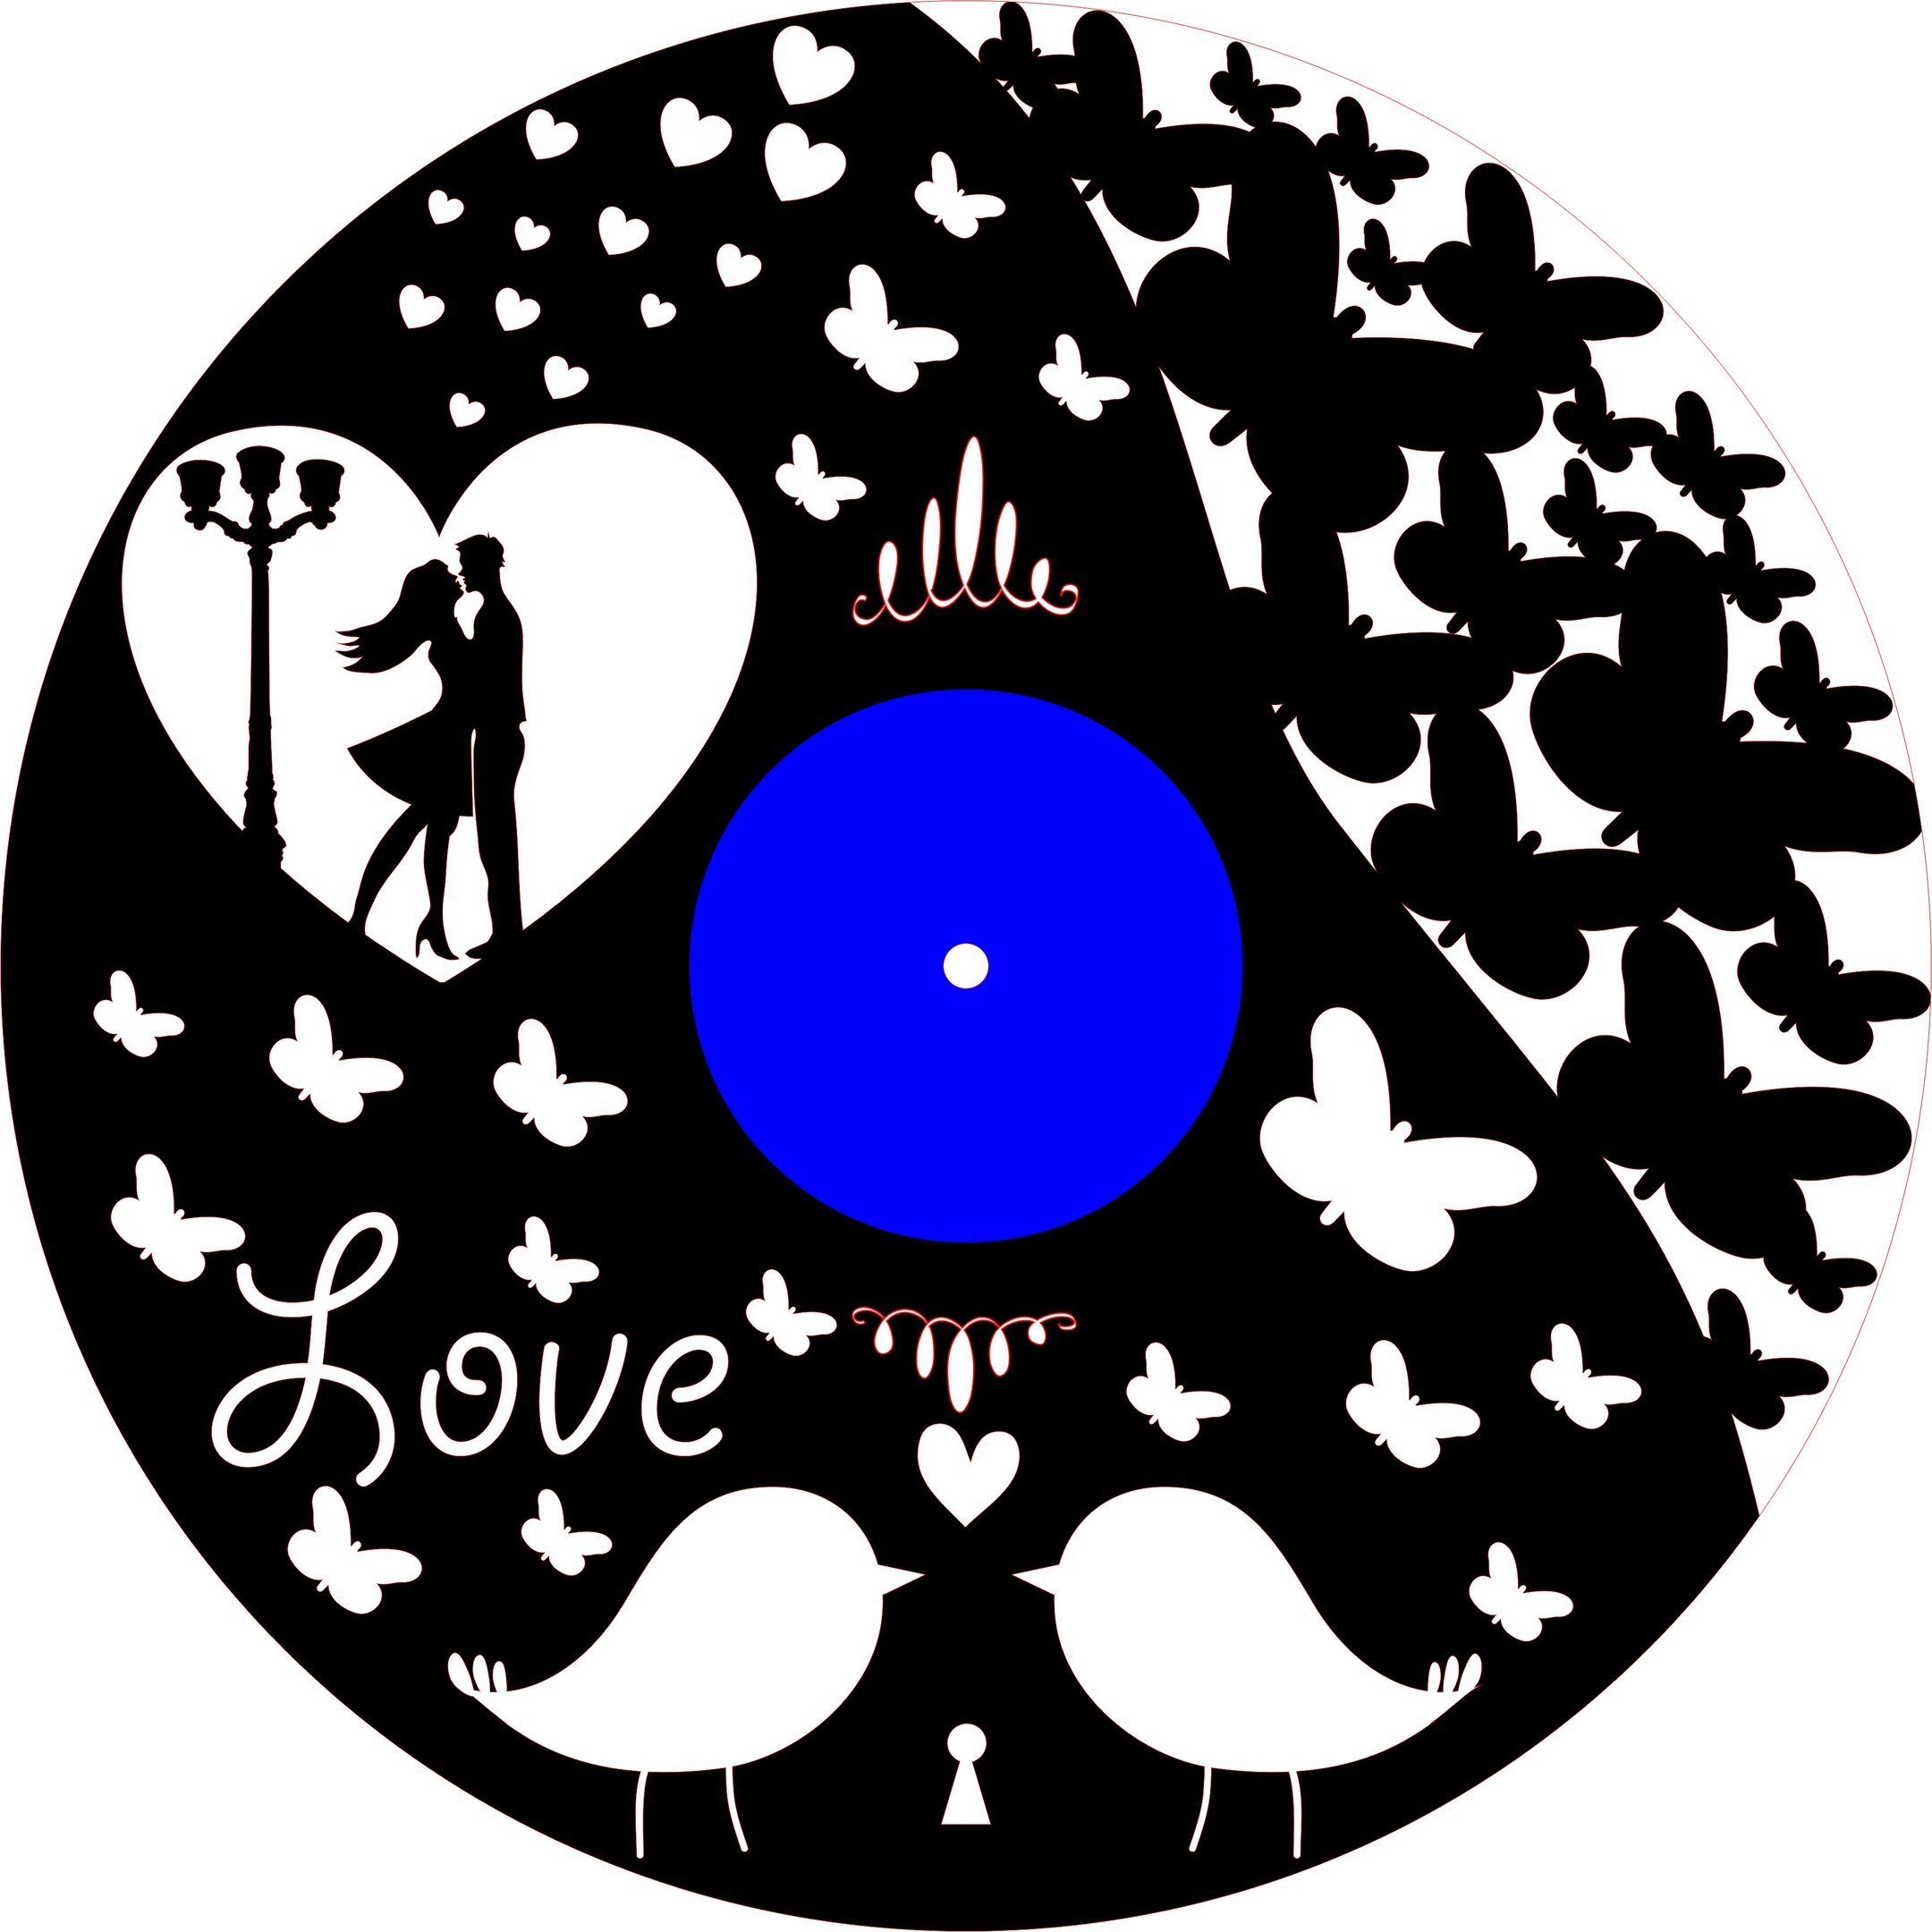 Gotov 2 Love And Heart Free CDR Vectors Art